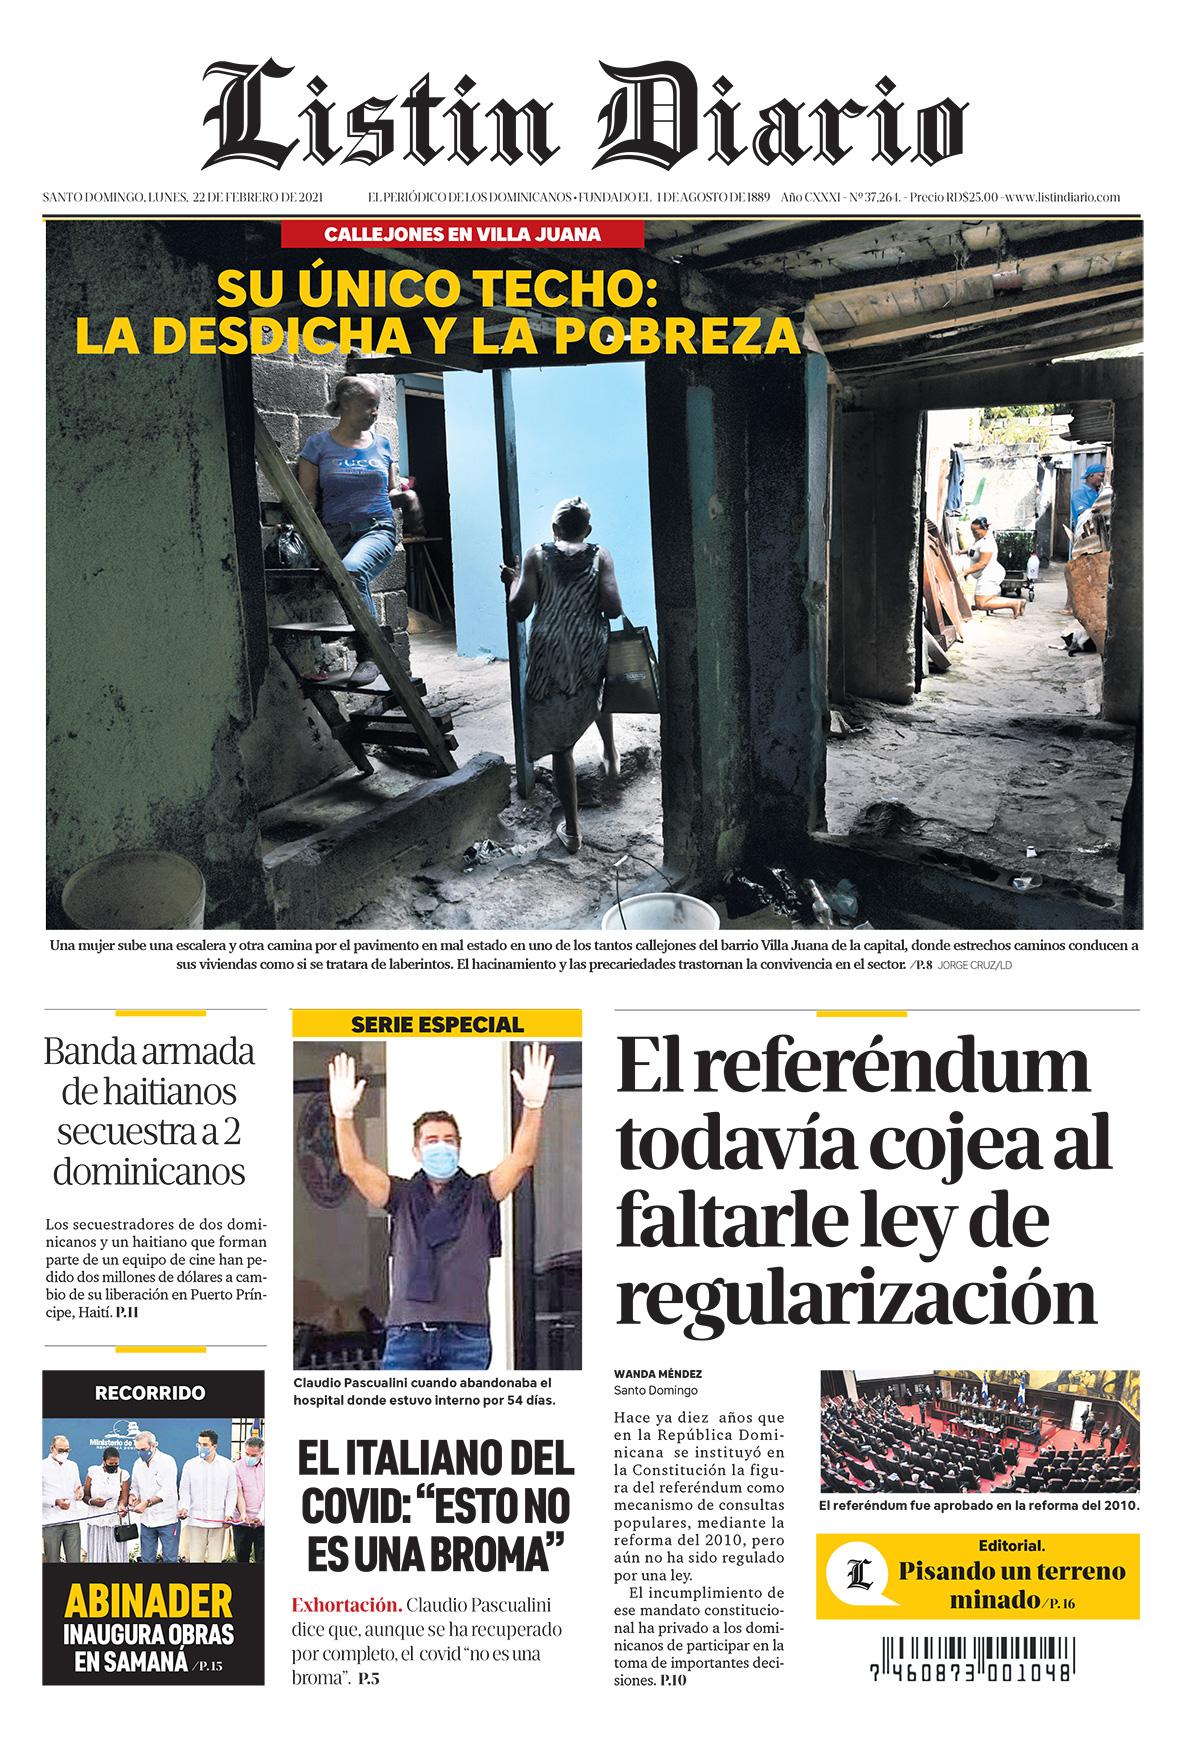 Portada Periódico Listín Diario, Lunes 22 de Febrero, 2021